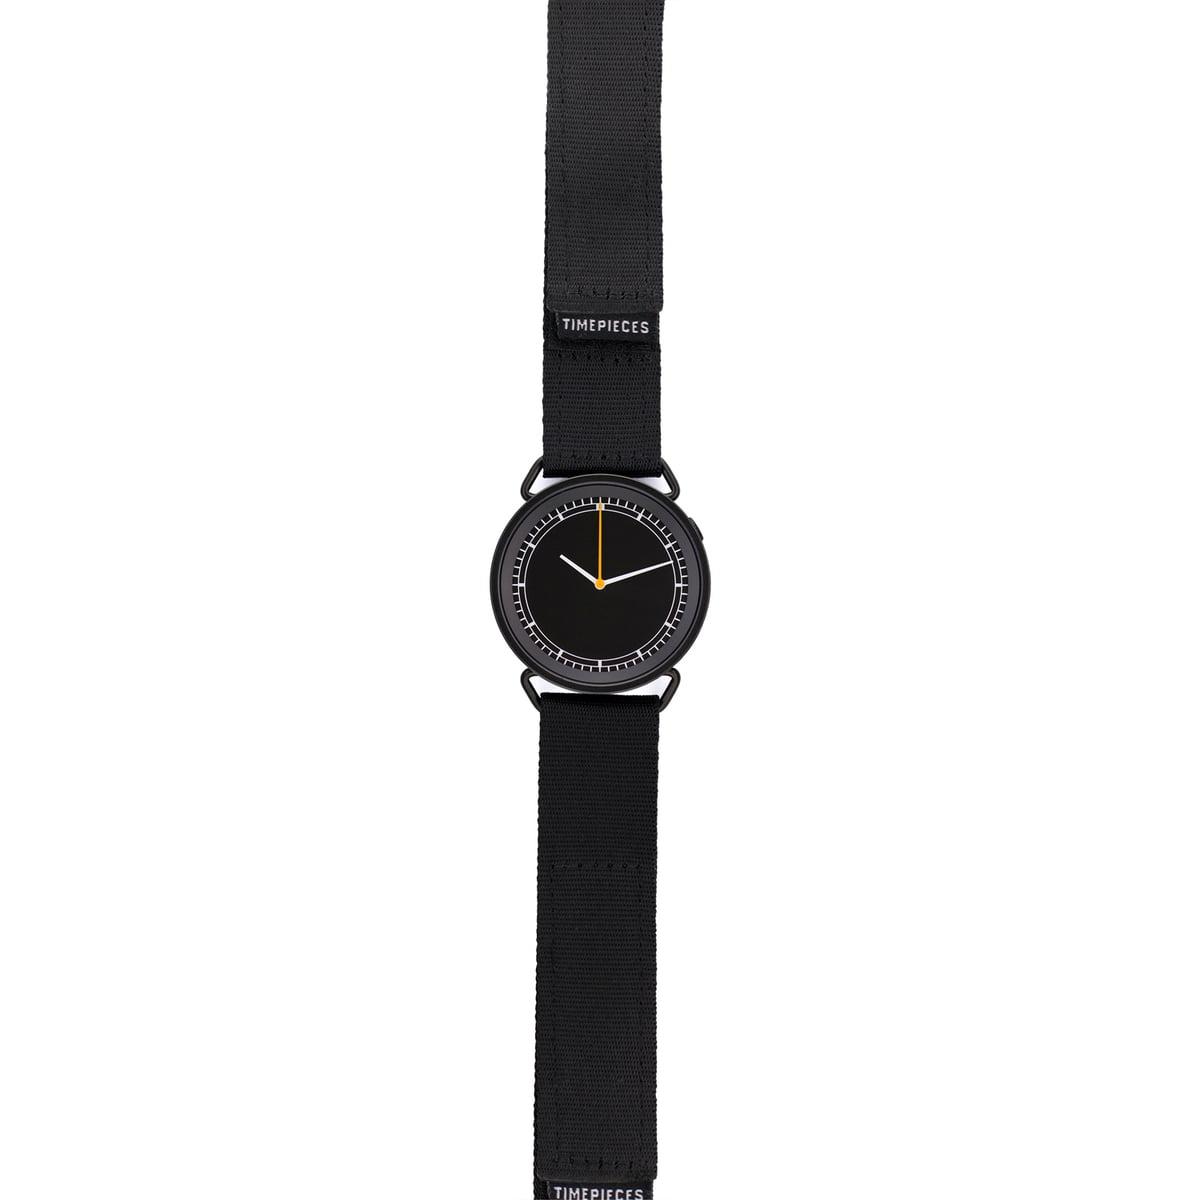 MUW Armbanduhr, schwarzes Ziffernblatt